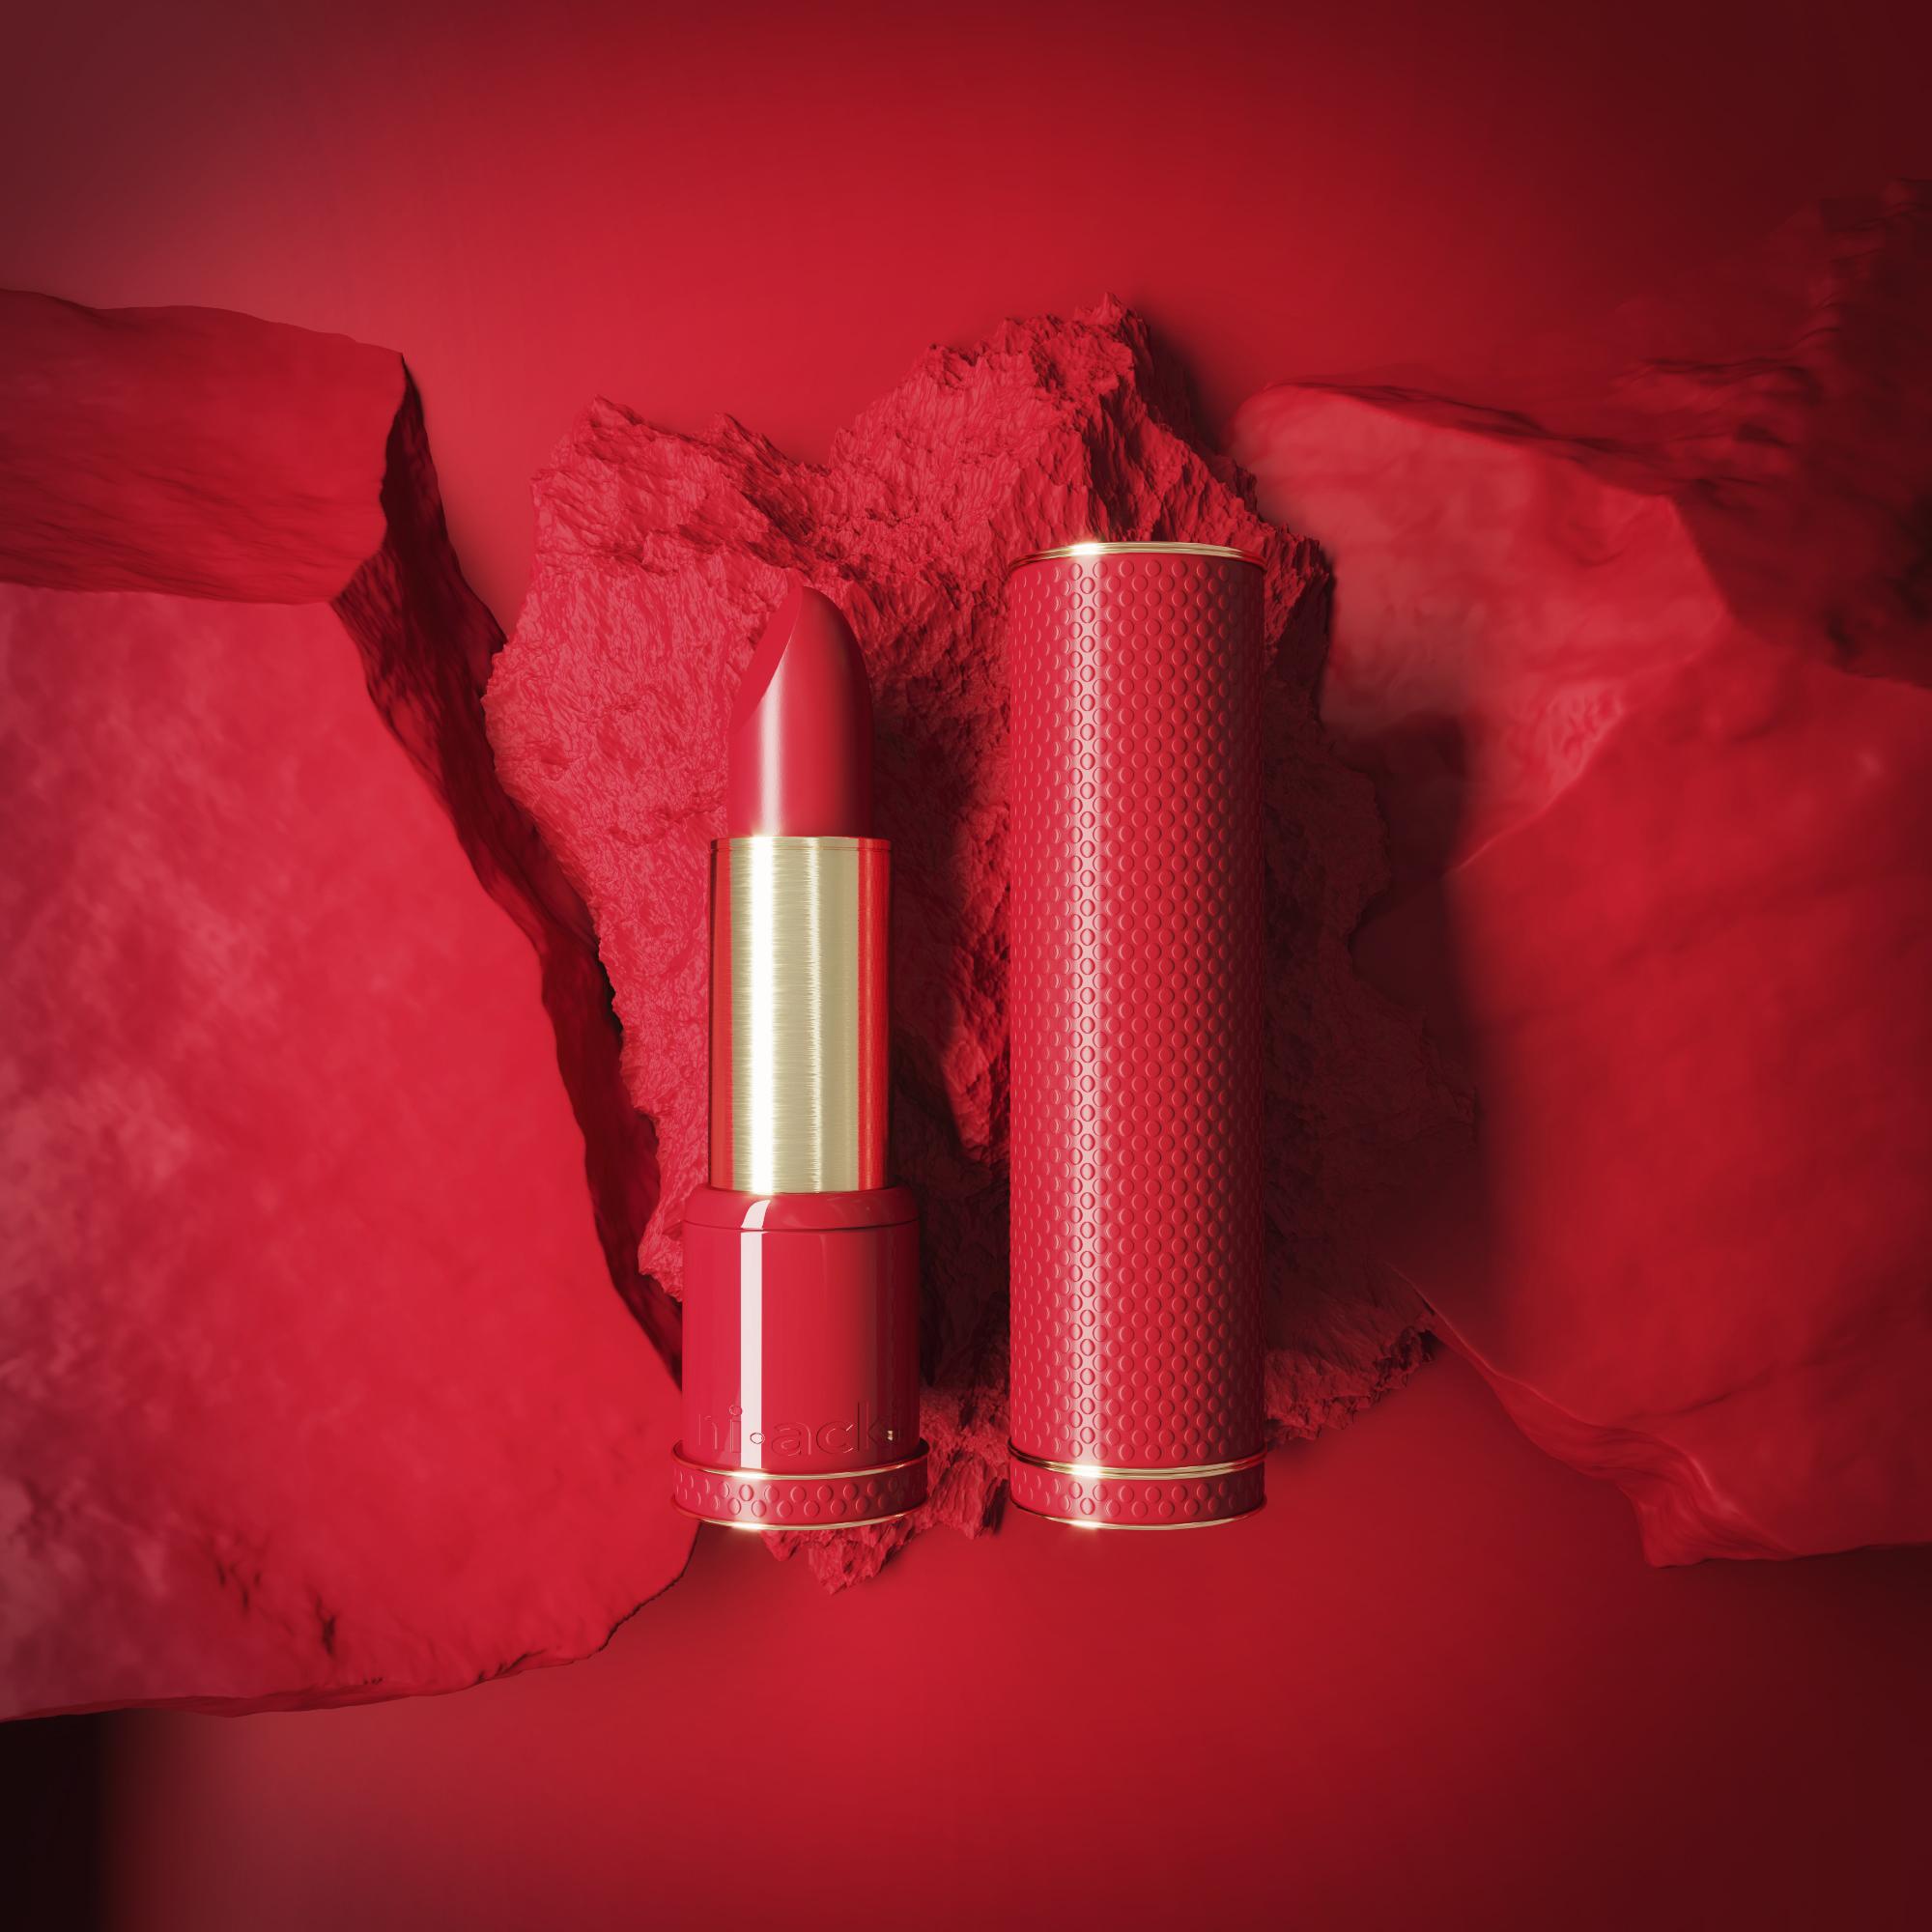 lipstic3_Post